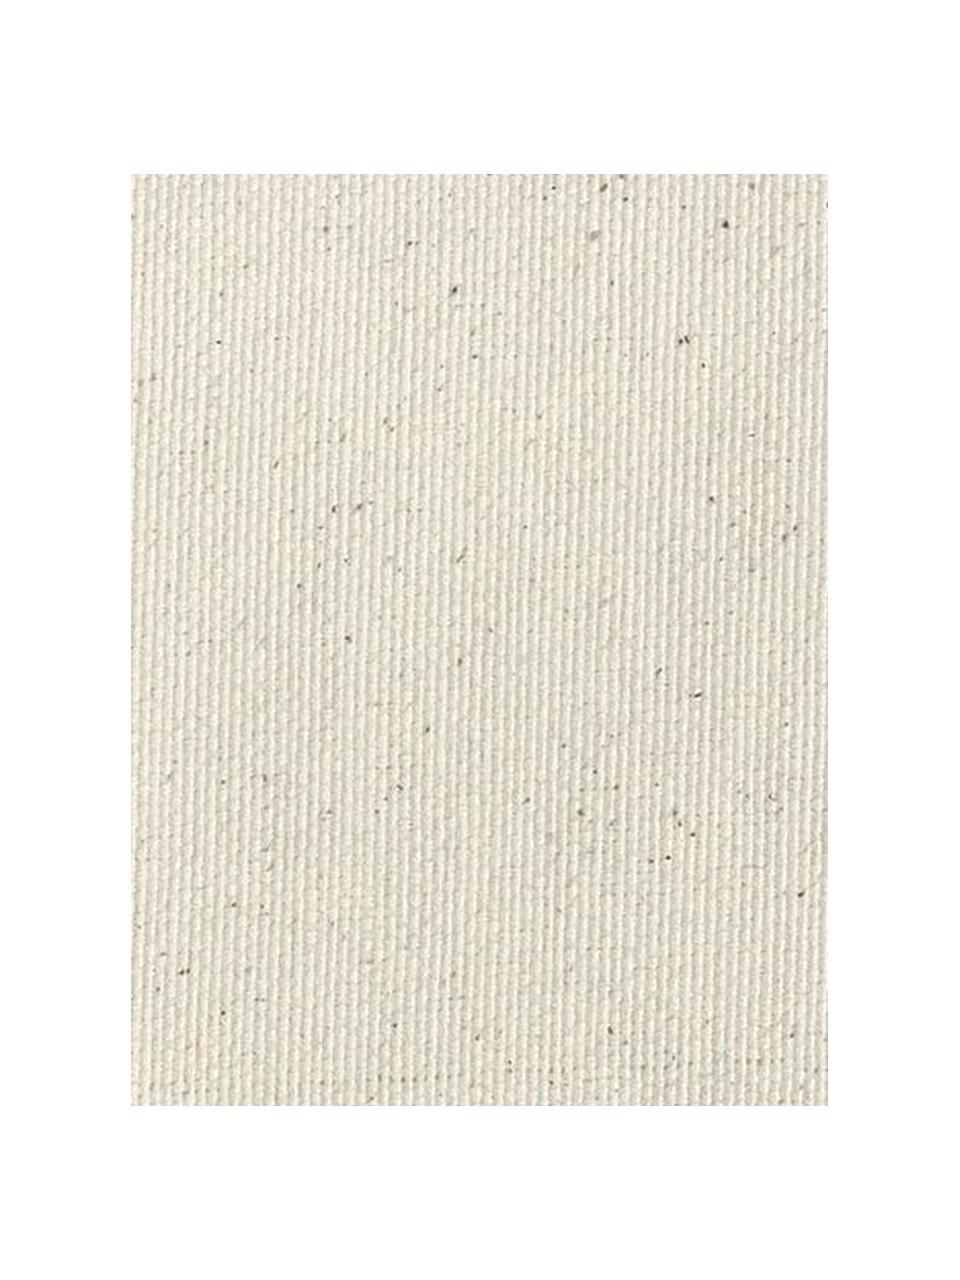 Copertura poltrona Levante, 65% cotone, 35% poliestere, Beige, Larg. 110 x Alt. 110 cm